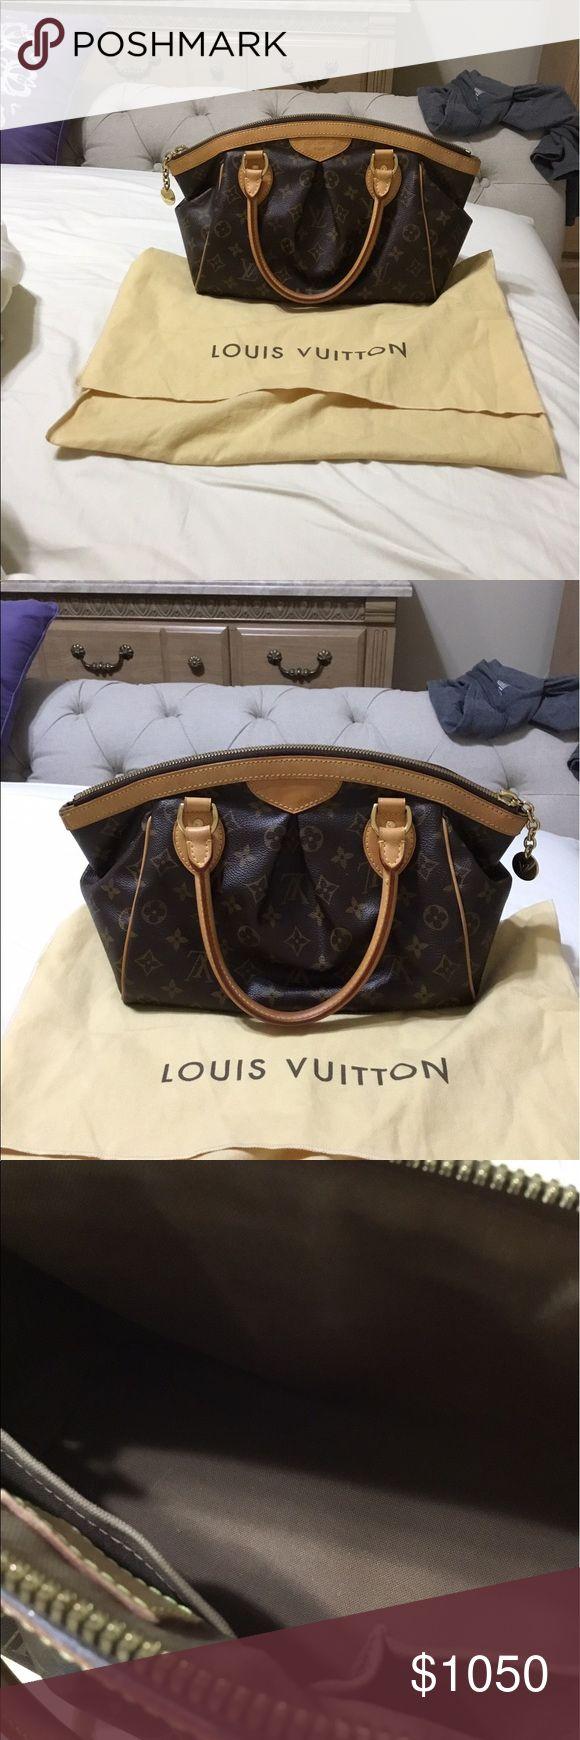 Selling this Authentic Louis Vuitton Tivoli PM w/ Dust Bag on Poshmark! My username is: cammy415. #shopmycloset #poshmark #fashion #shopping #style #forsale #Louis Vuitton #Handbags